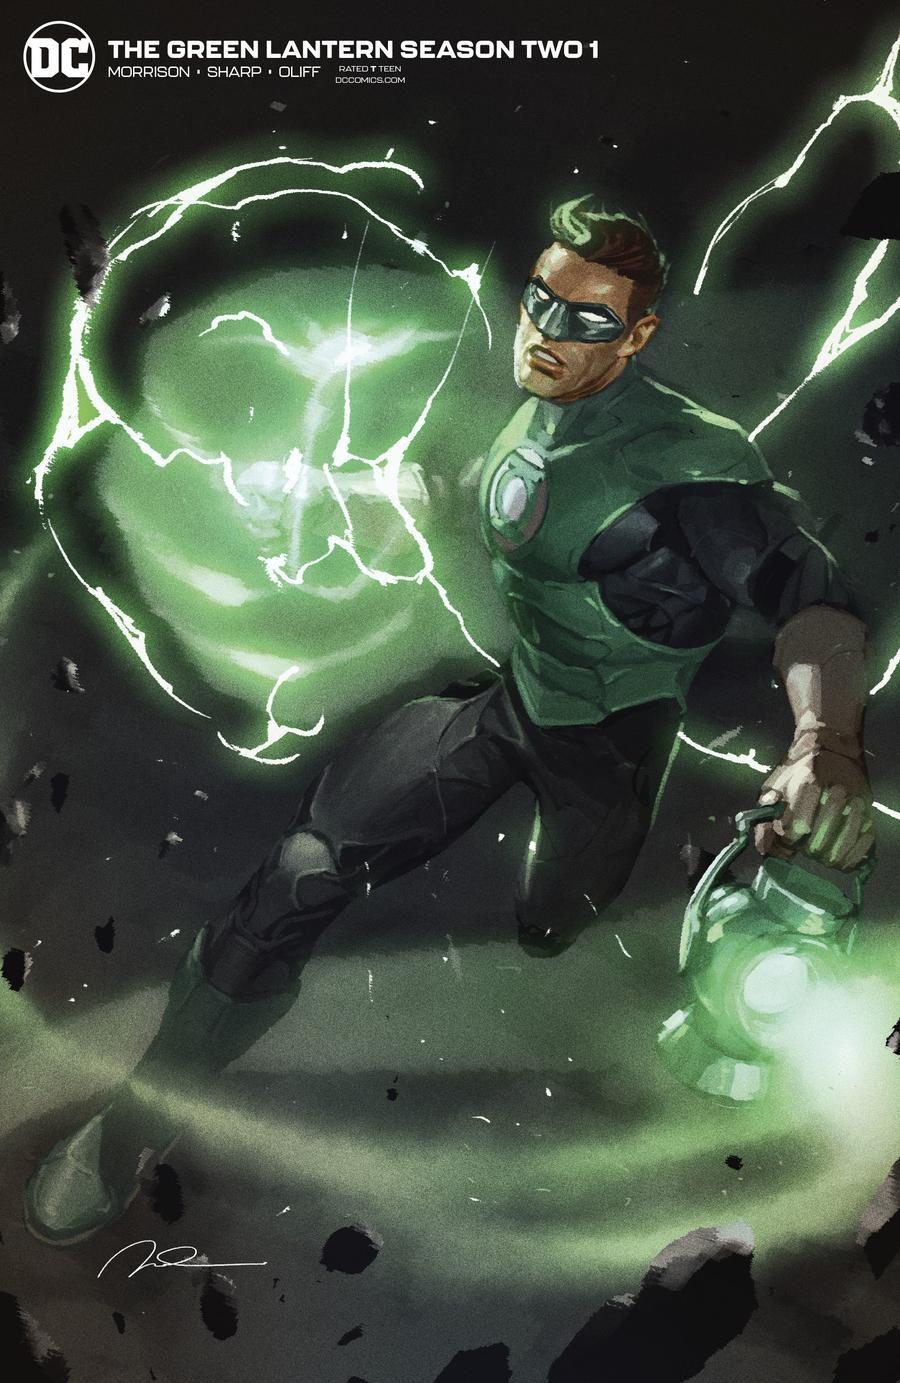 Green Lantern Vol 6 Season 2 #1 Cover B Variant Gerald Parel Cover